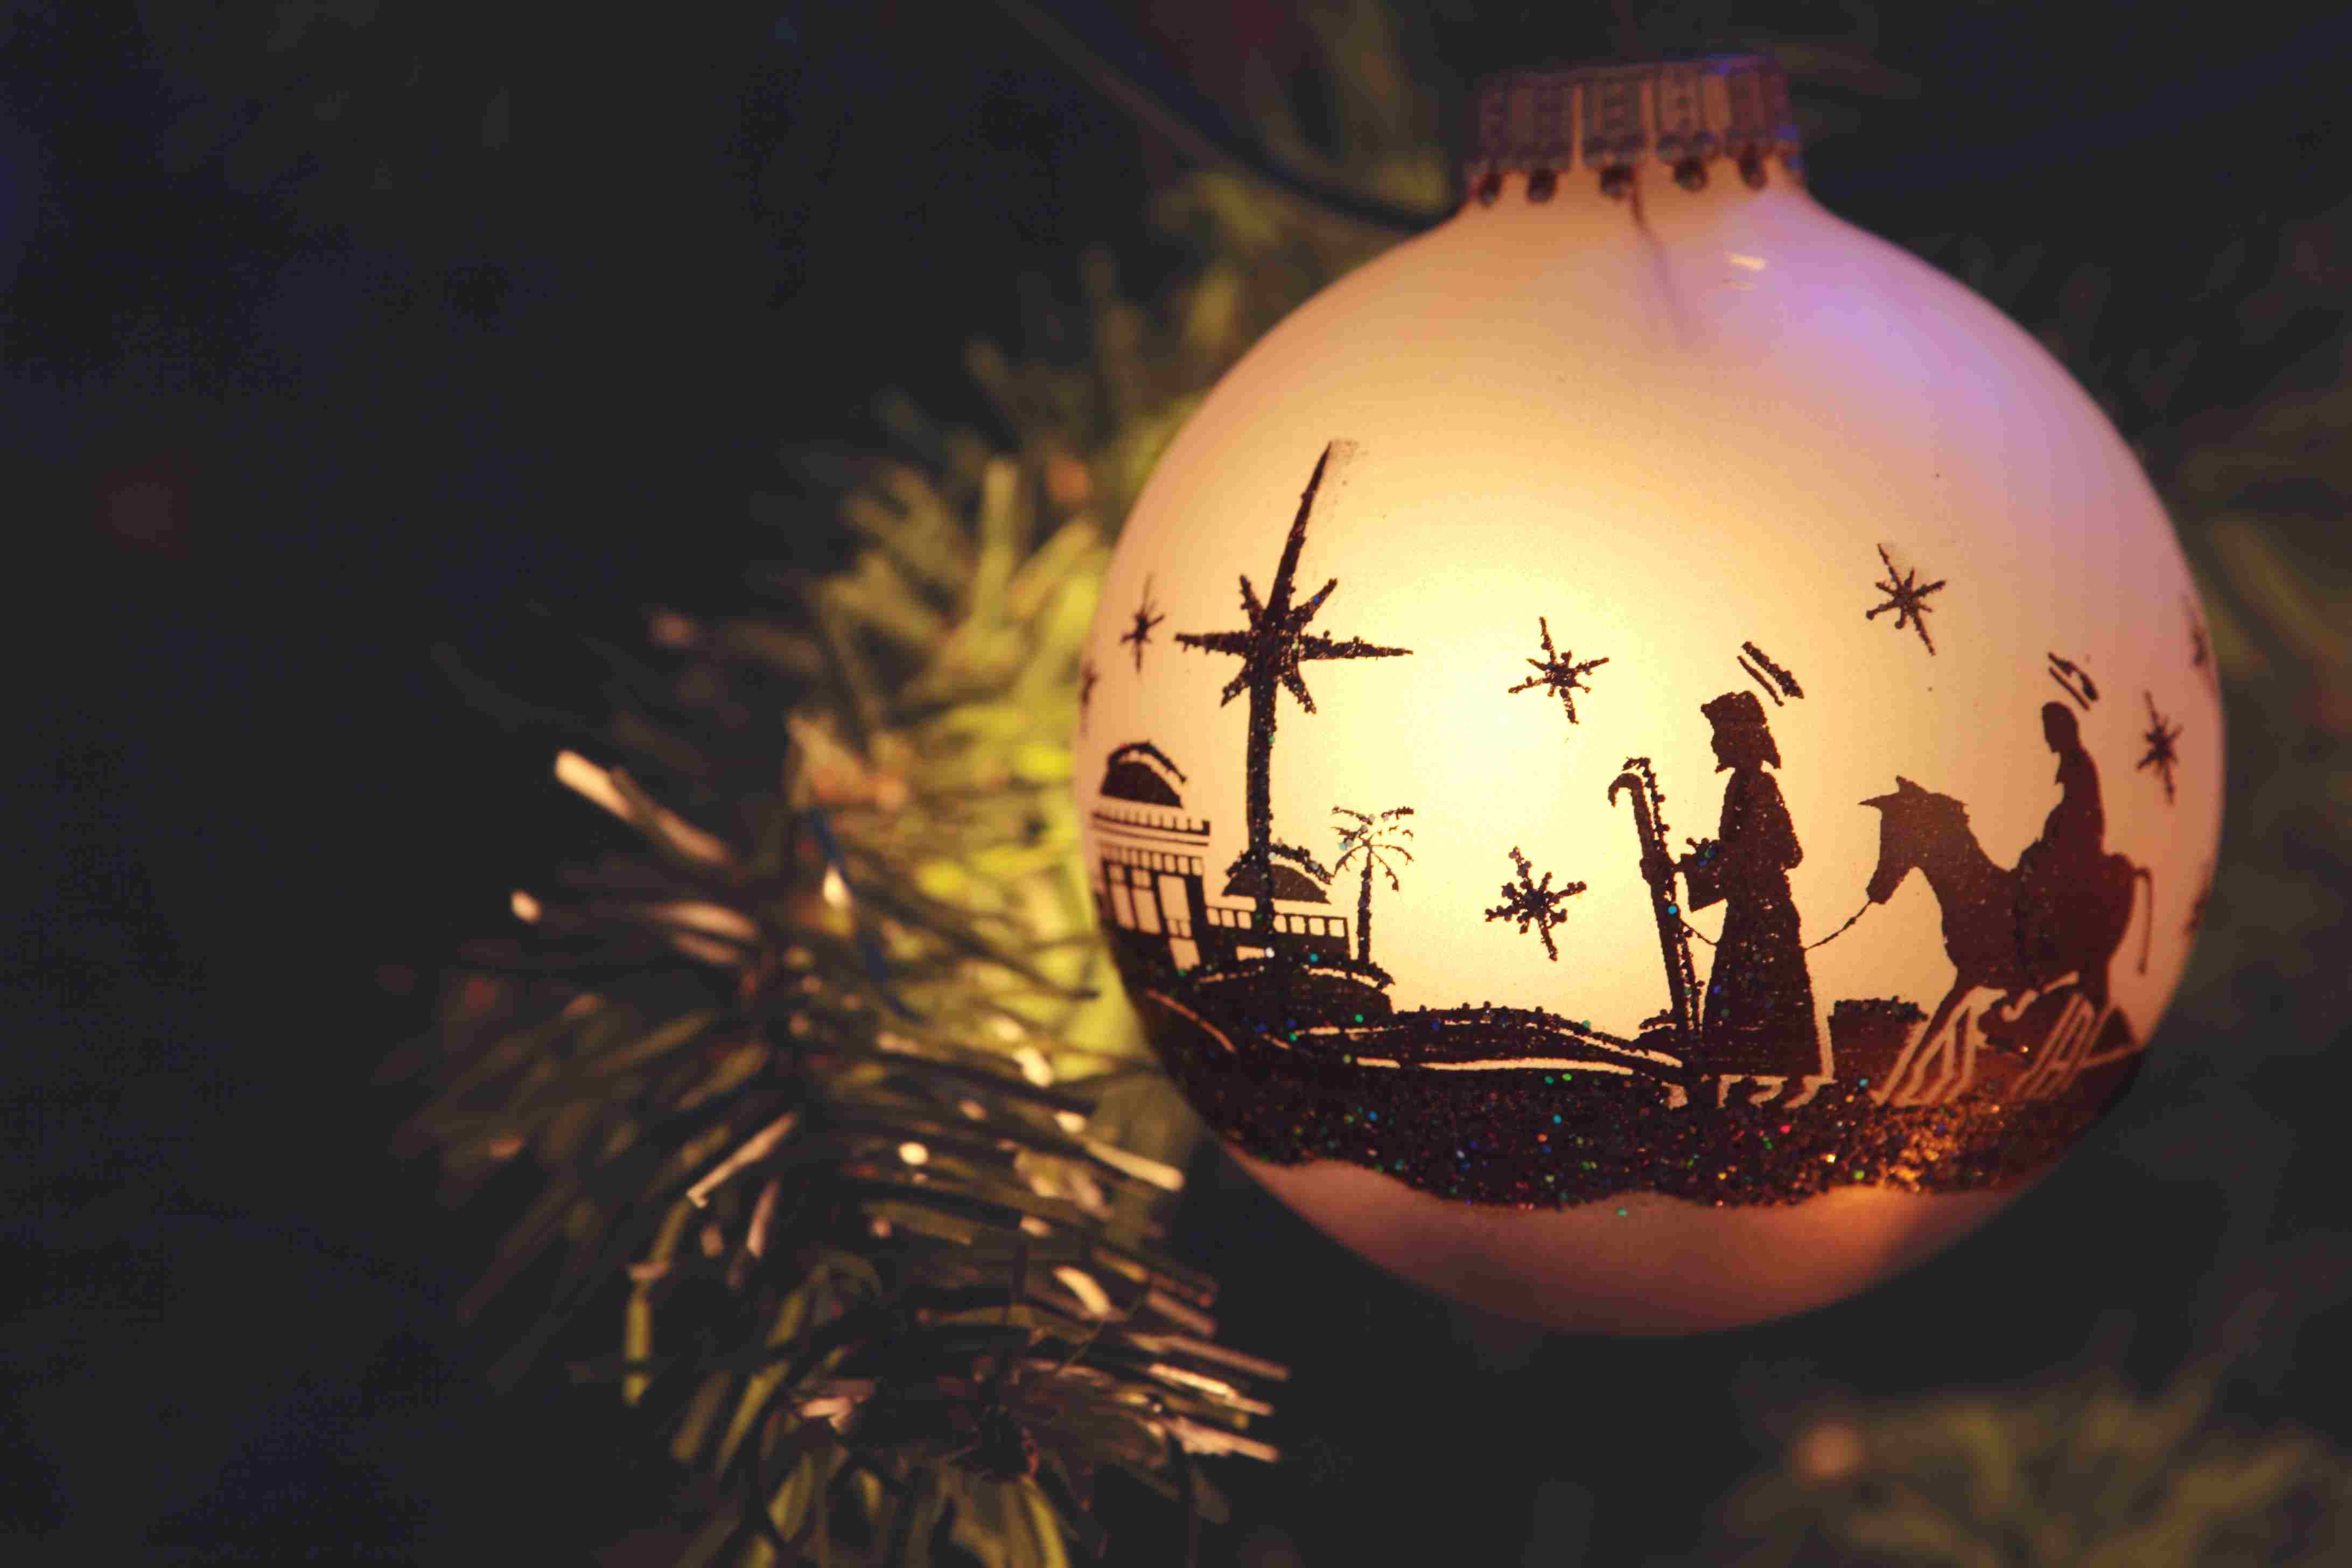 Religious: Nativity Scene silhouette on Christmas Ornament